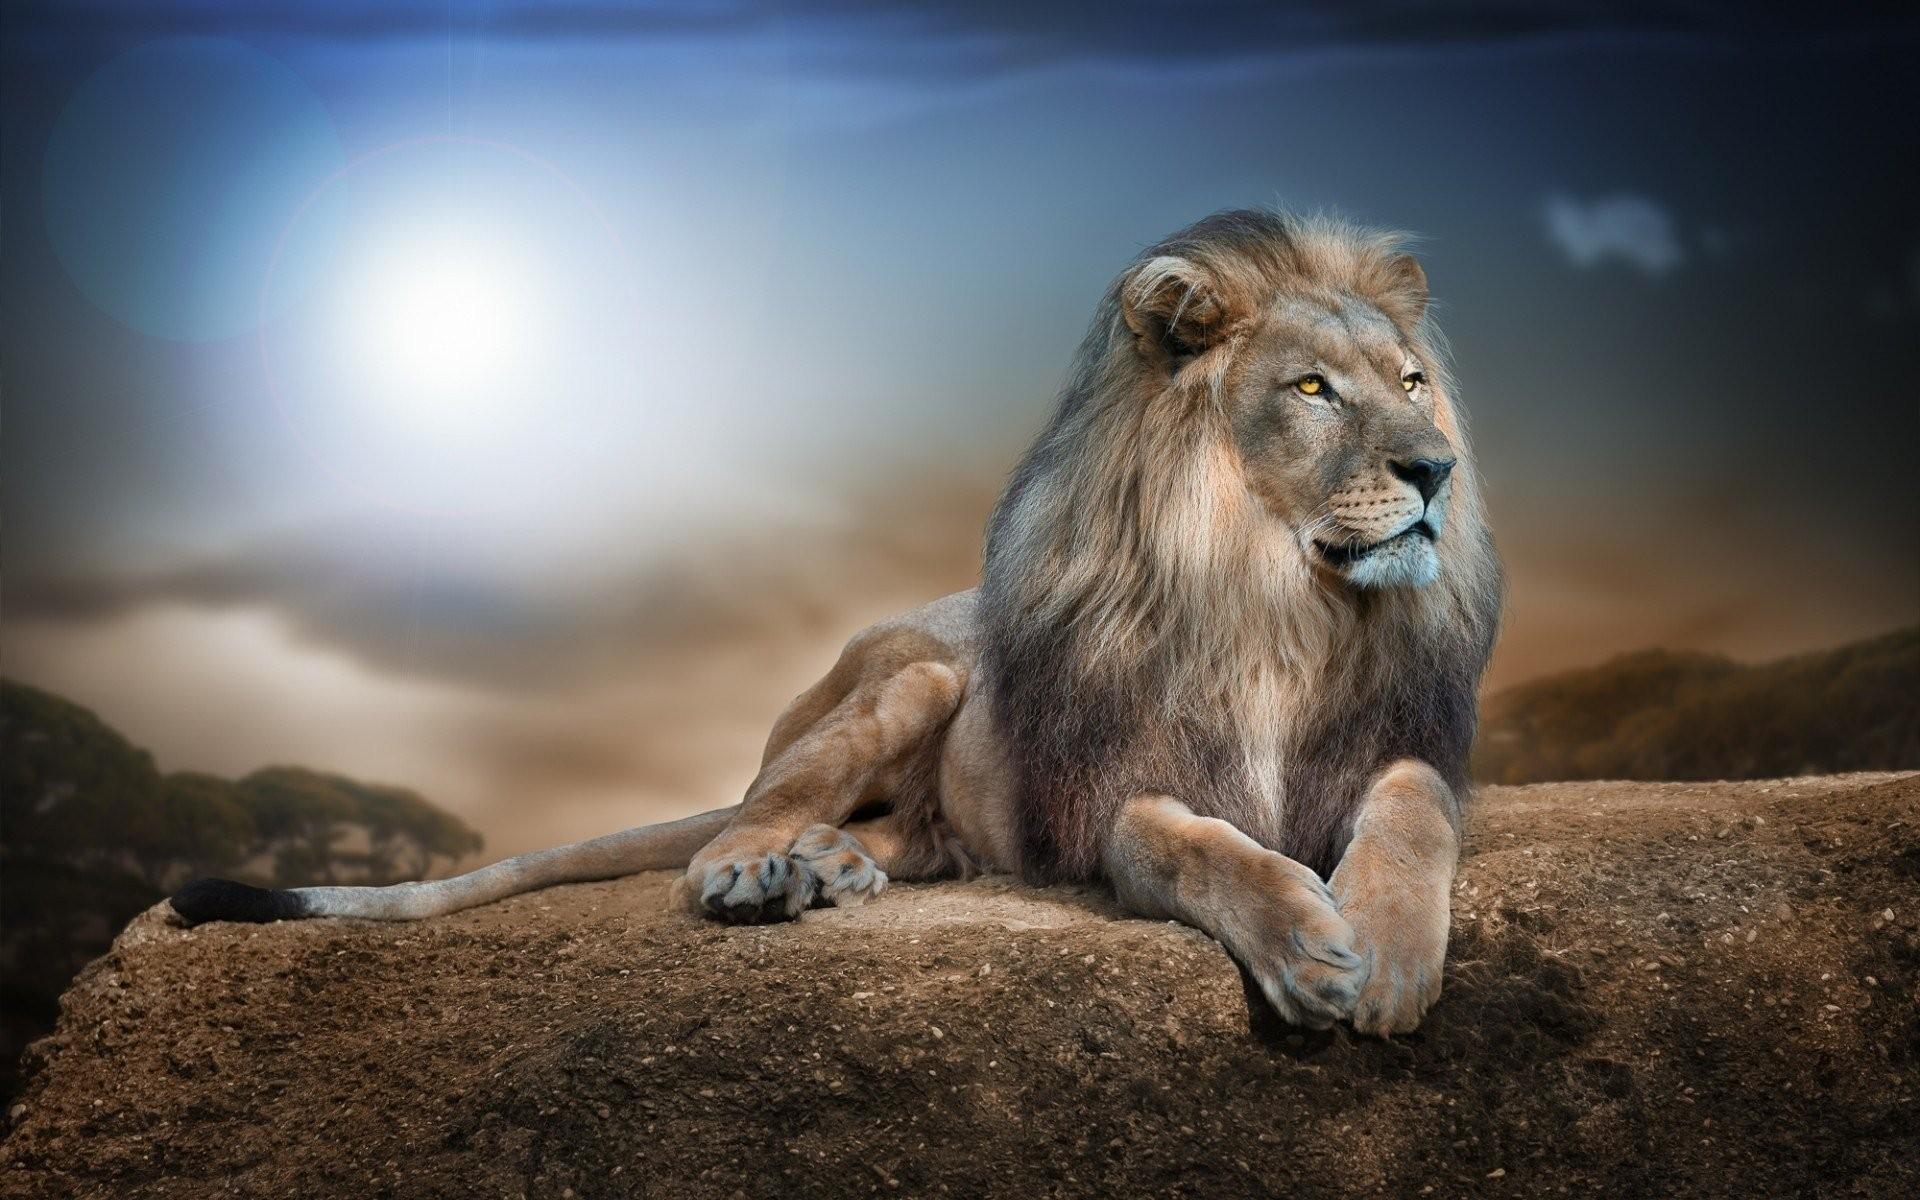 Wonderful Wallpaper Macbook Lion - 287735-lion-wallpaper-1920x1200-for-ios  2018_45618.jpg